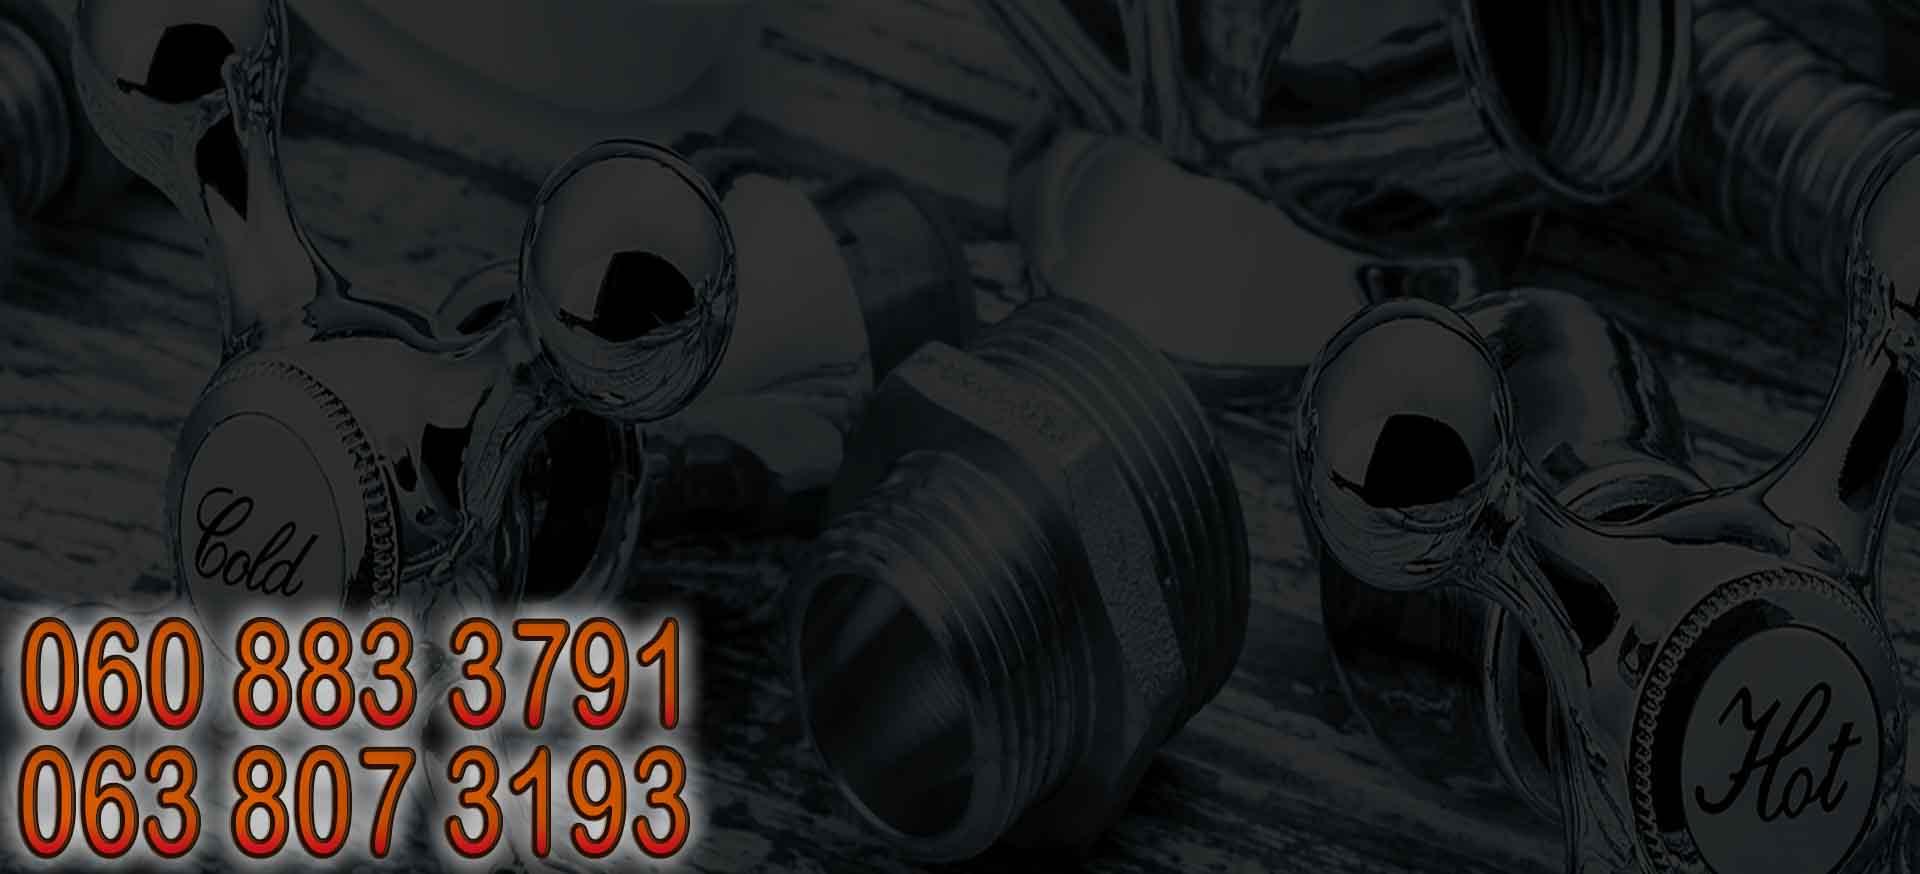 Plumber Brakpan Central